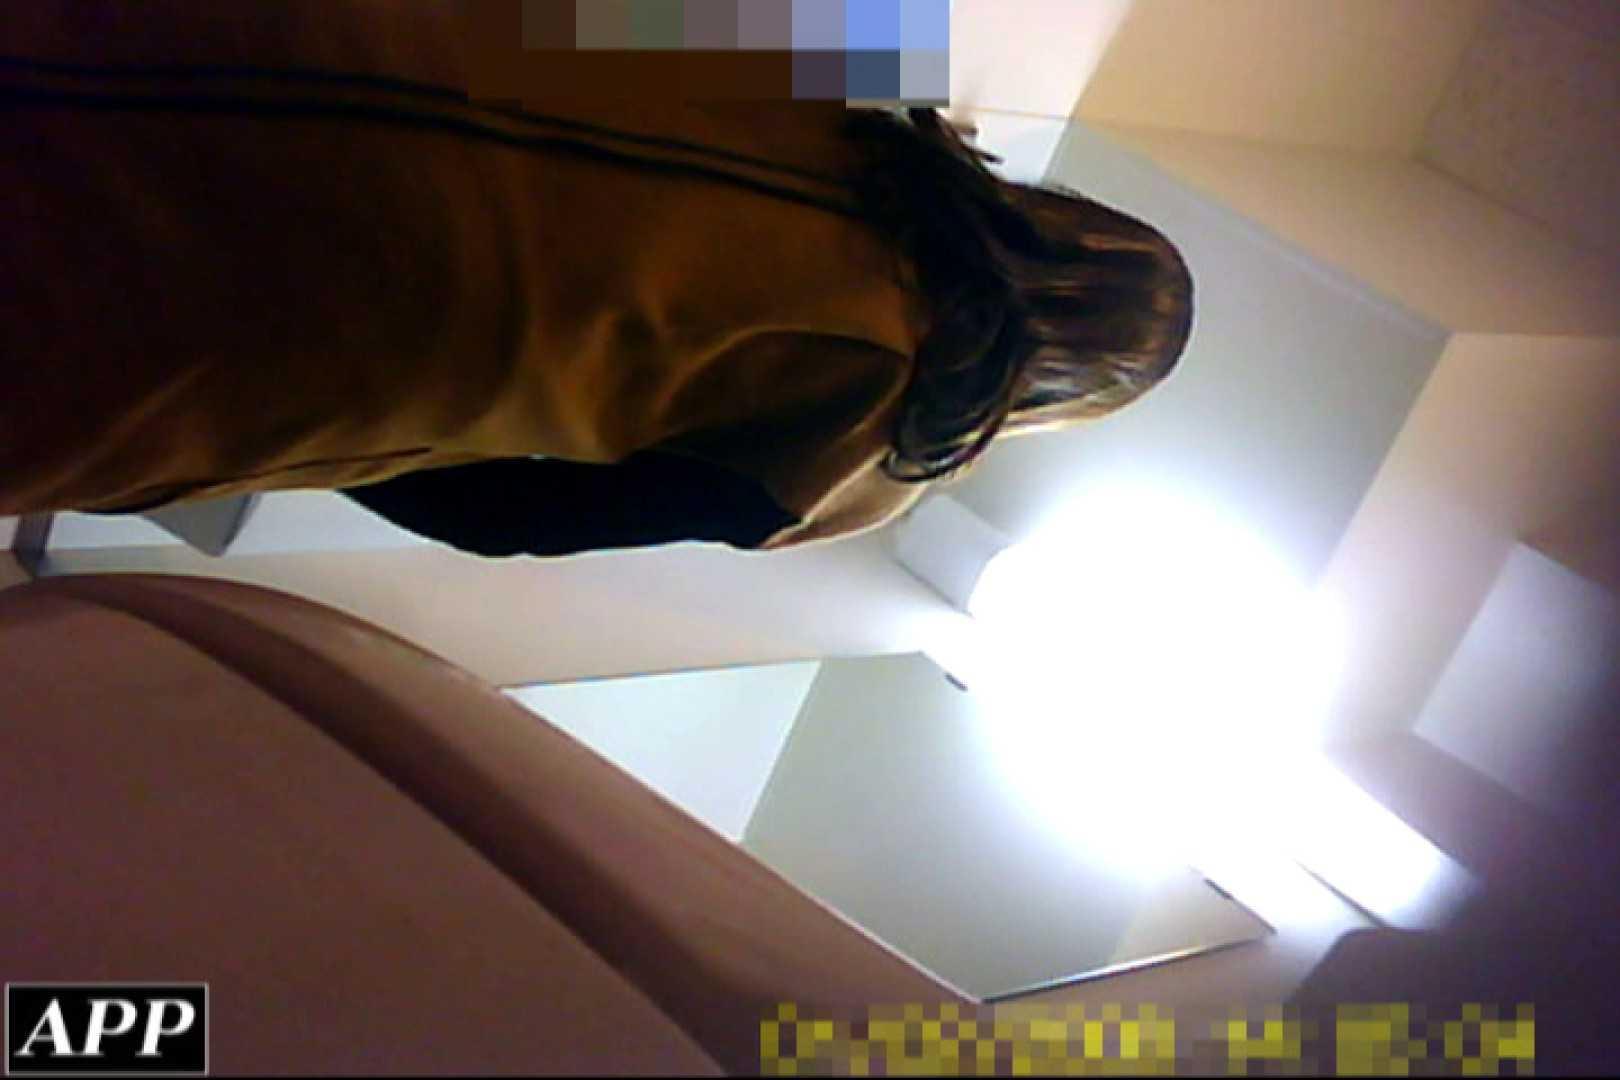 3視点洗面所 vol.051 OLセックス | 洗面所  105画像 105